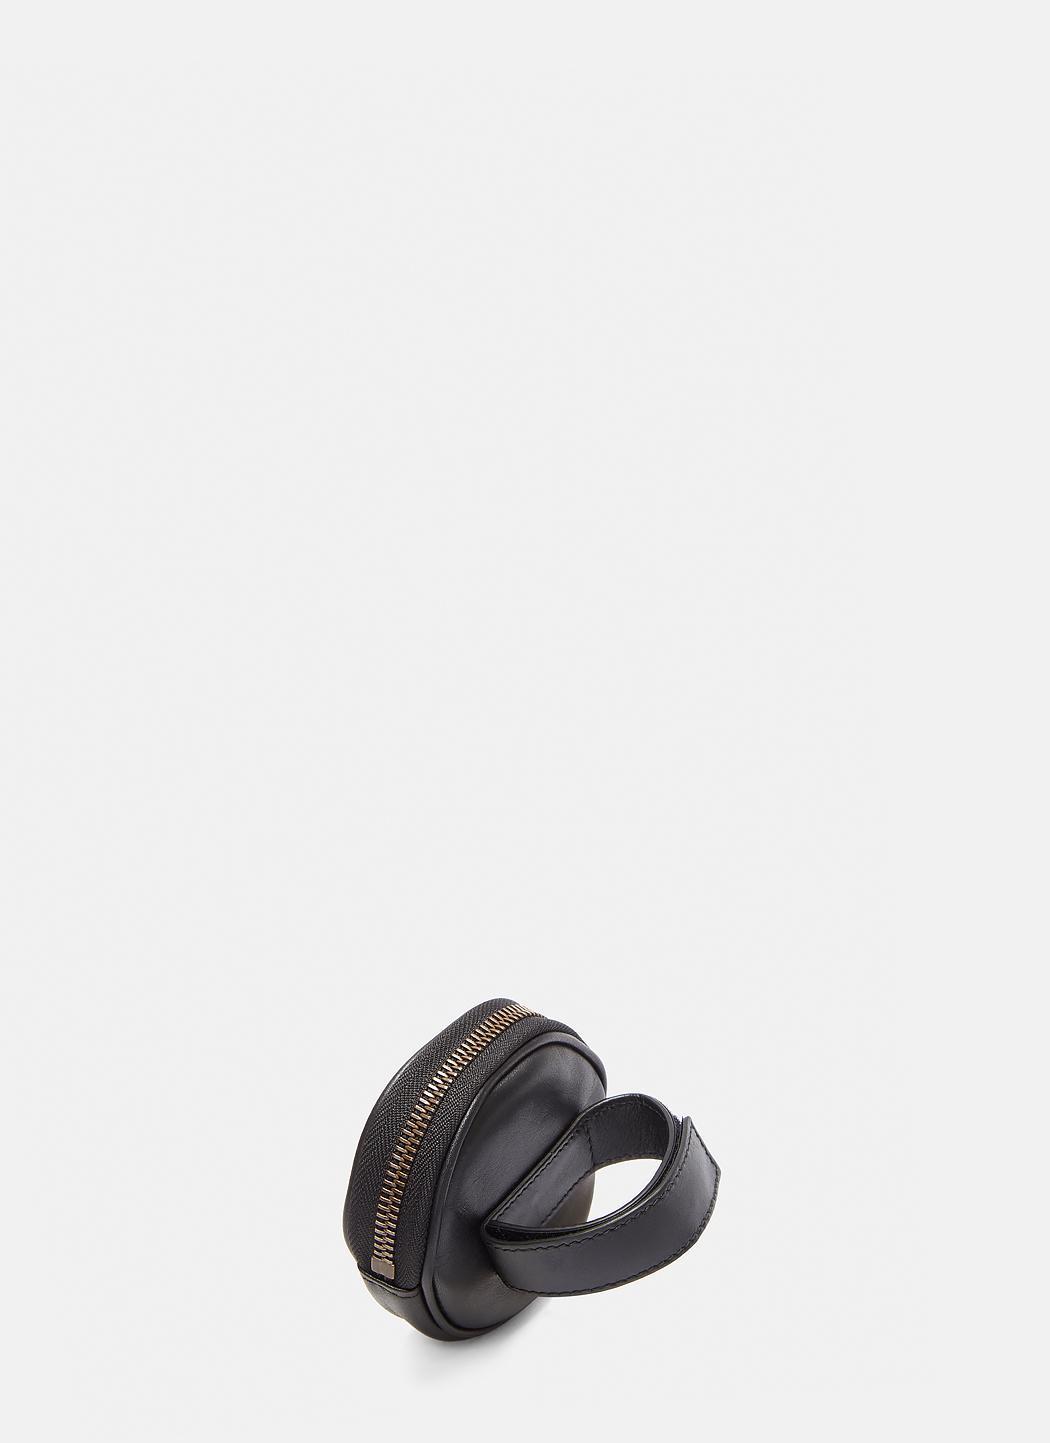 83bdaa77e7b8 Gucci Marmont Animal Stud Wrist Pouch In Black in Black - Lyst